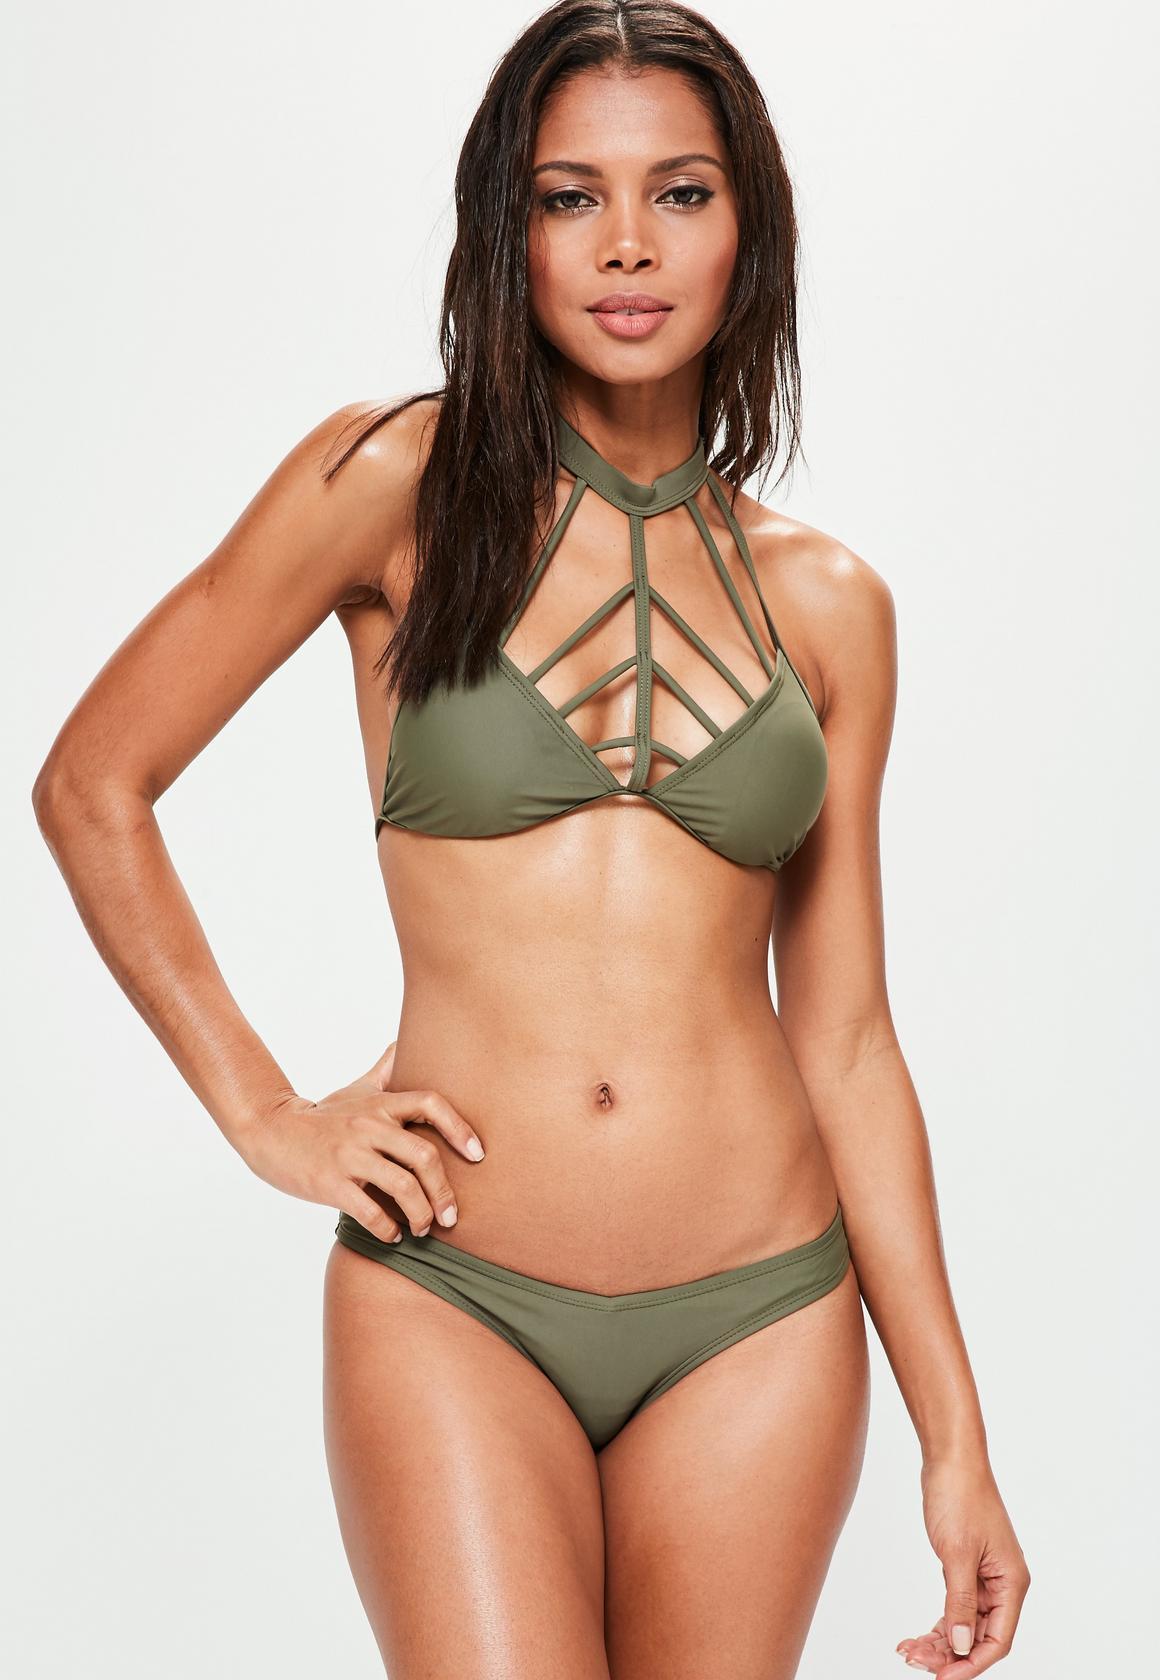 triangle bikini previous next SSIDPJW